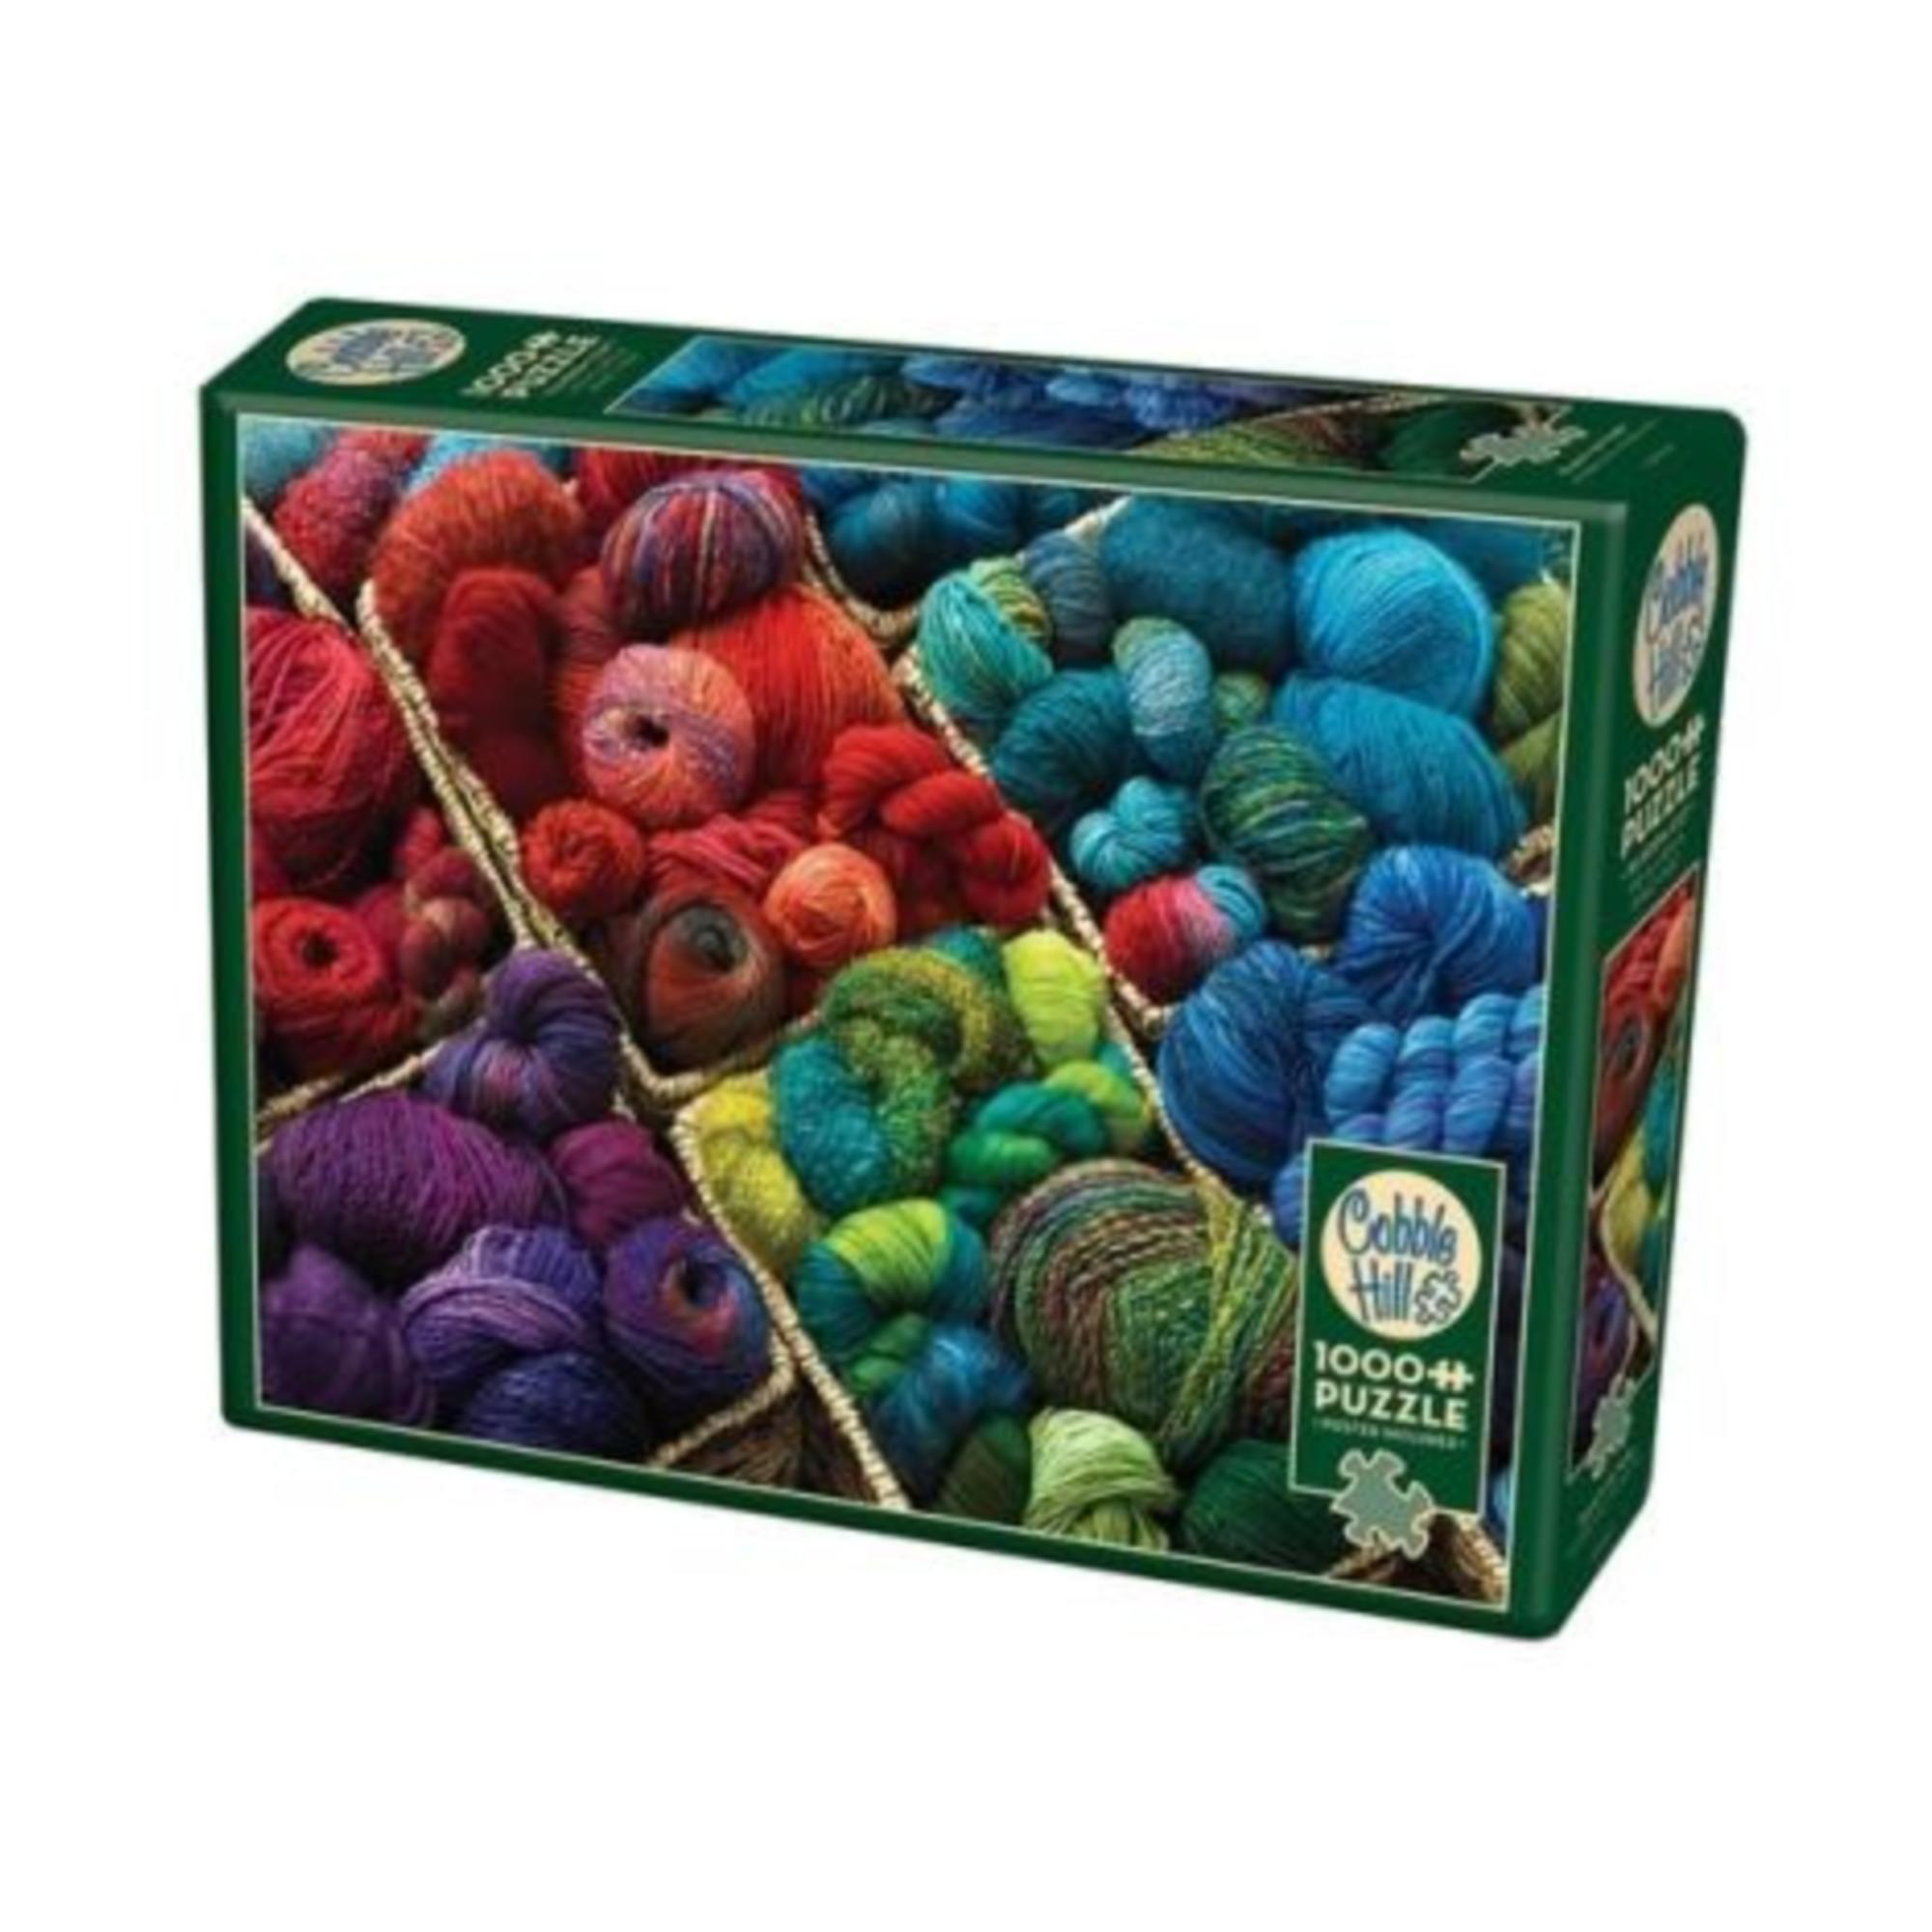 Cobble Hill Puzzle 1000: Plenty of Yarn